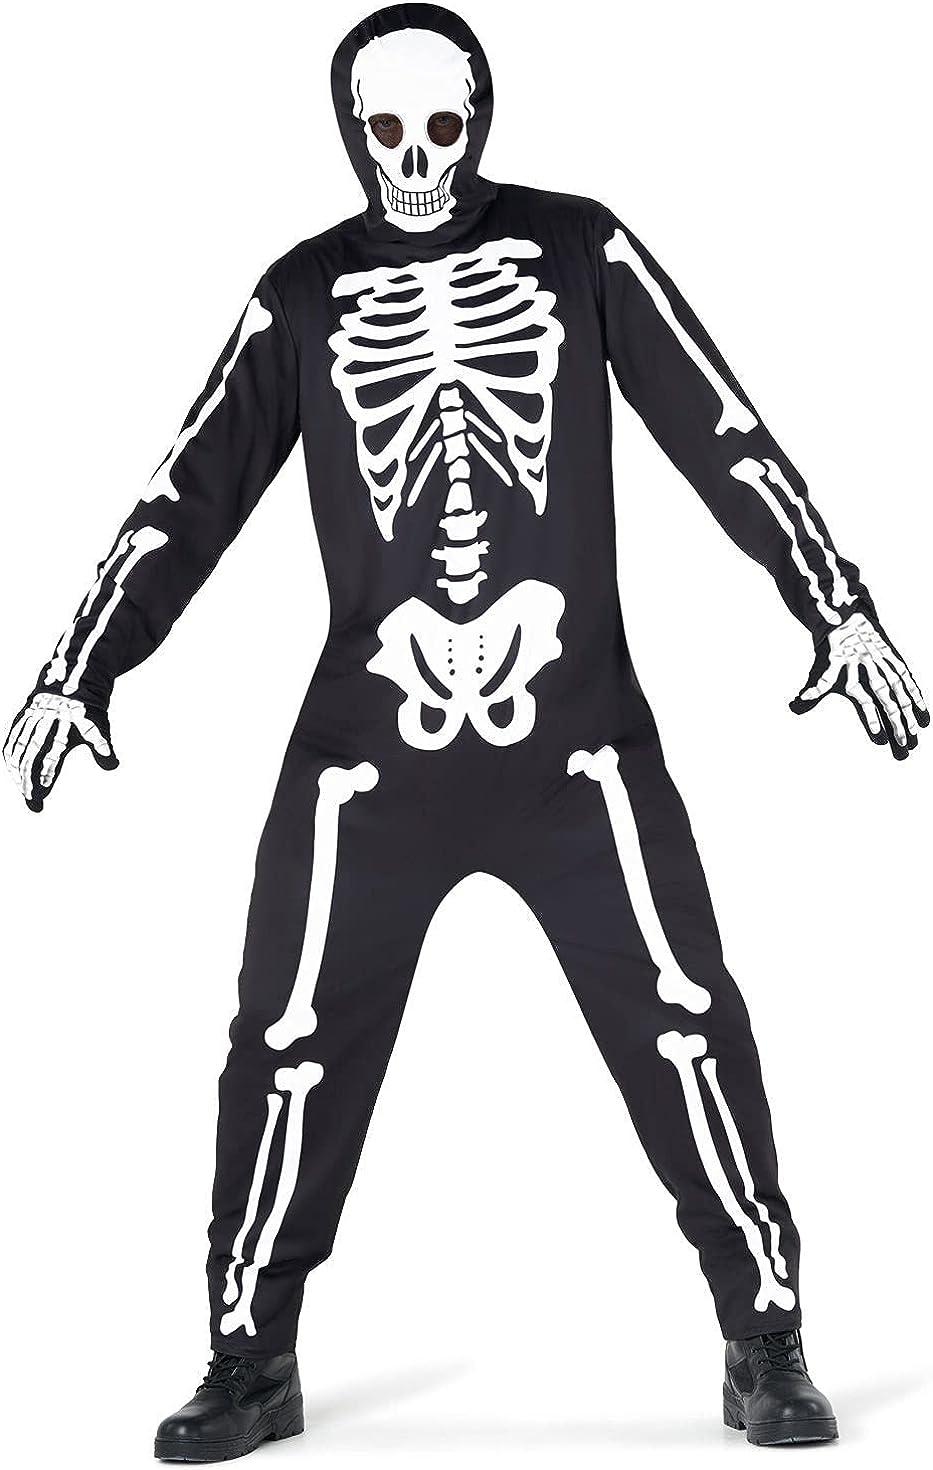 Morph Deluxe Costume Mens Skeleton Halloween Max 57% OFF Avail Men